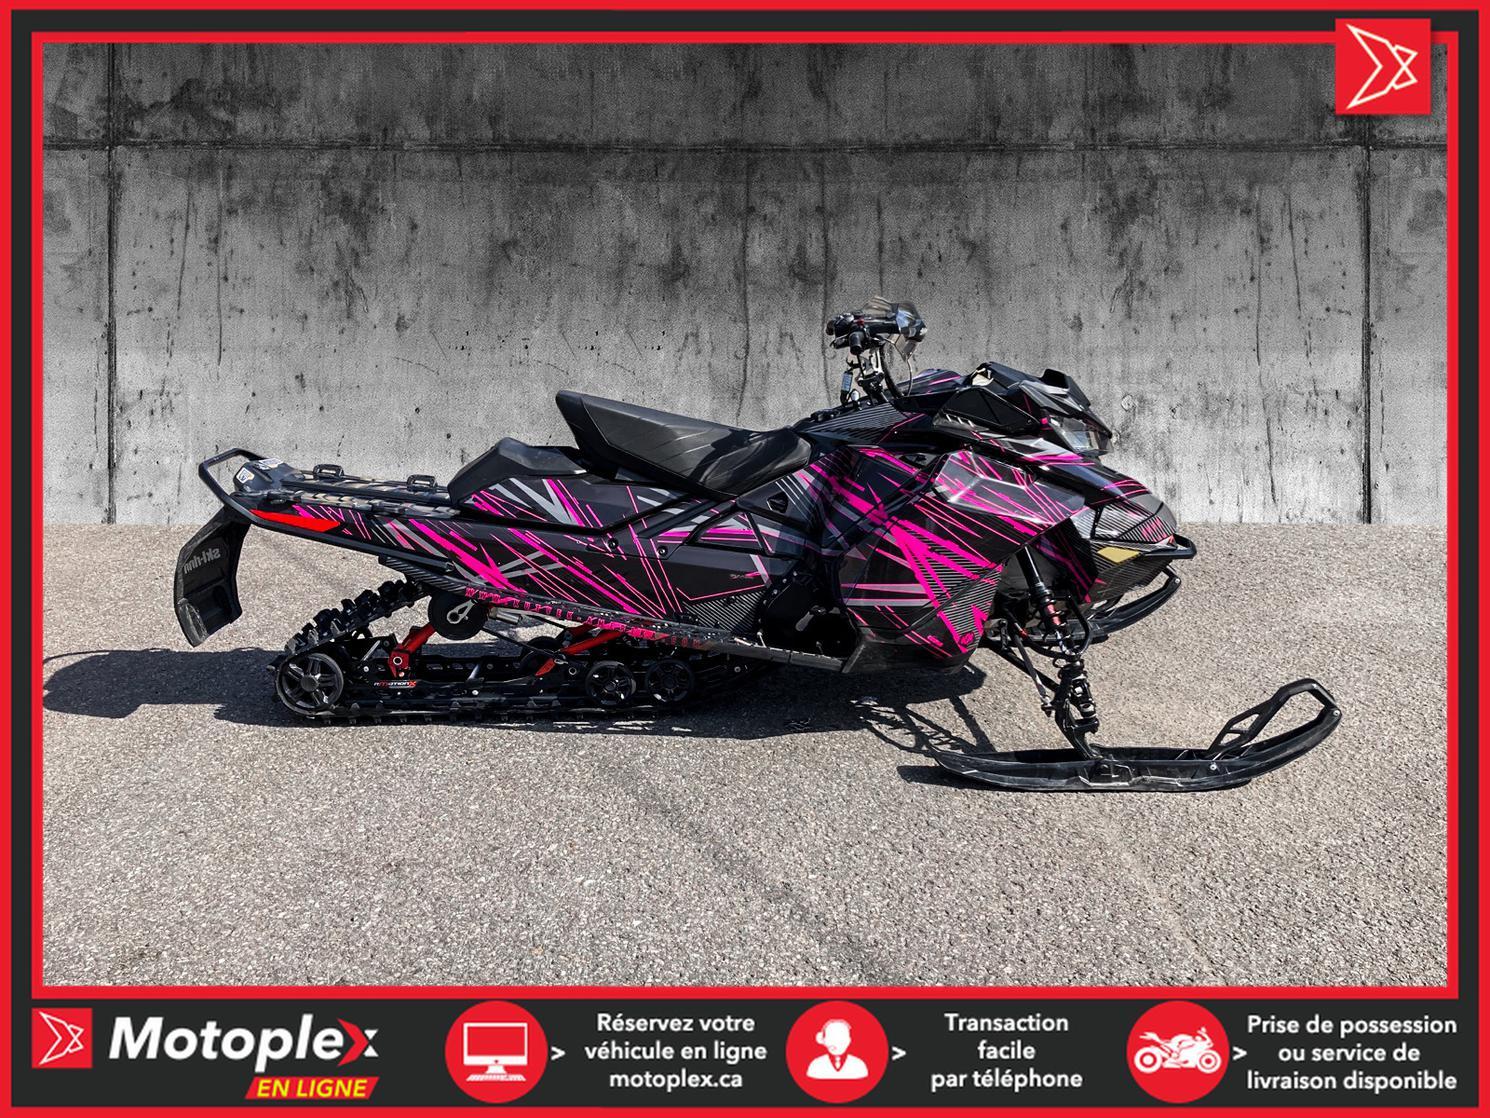 2021 Ski-Doo RENEGADE 850 X - 59$/semaine